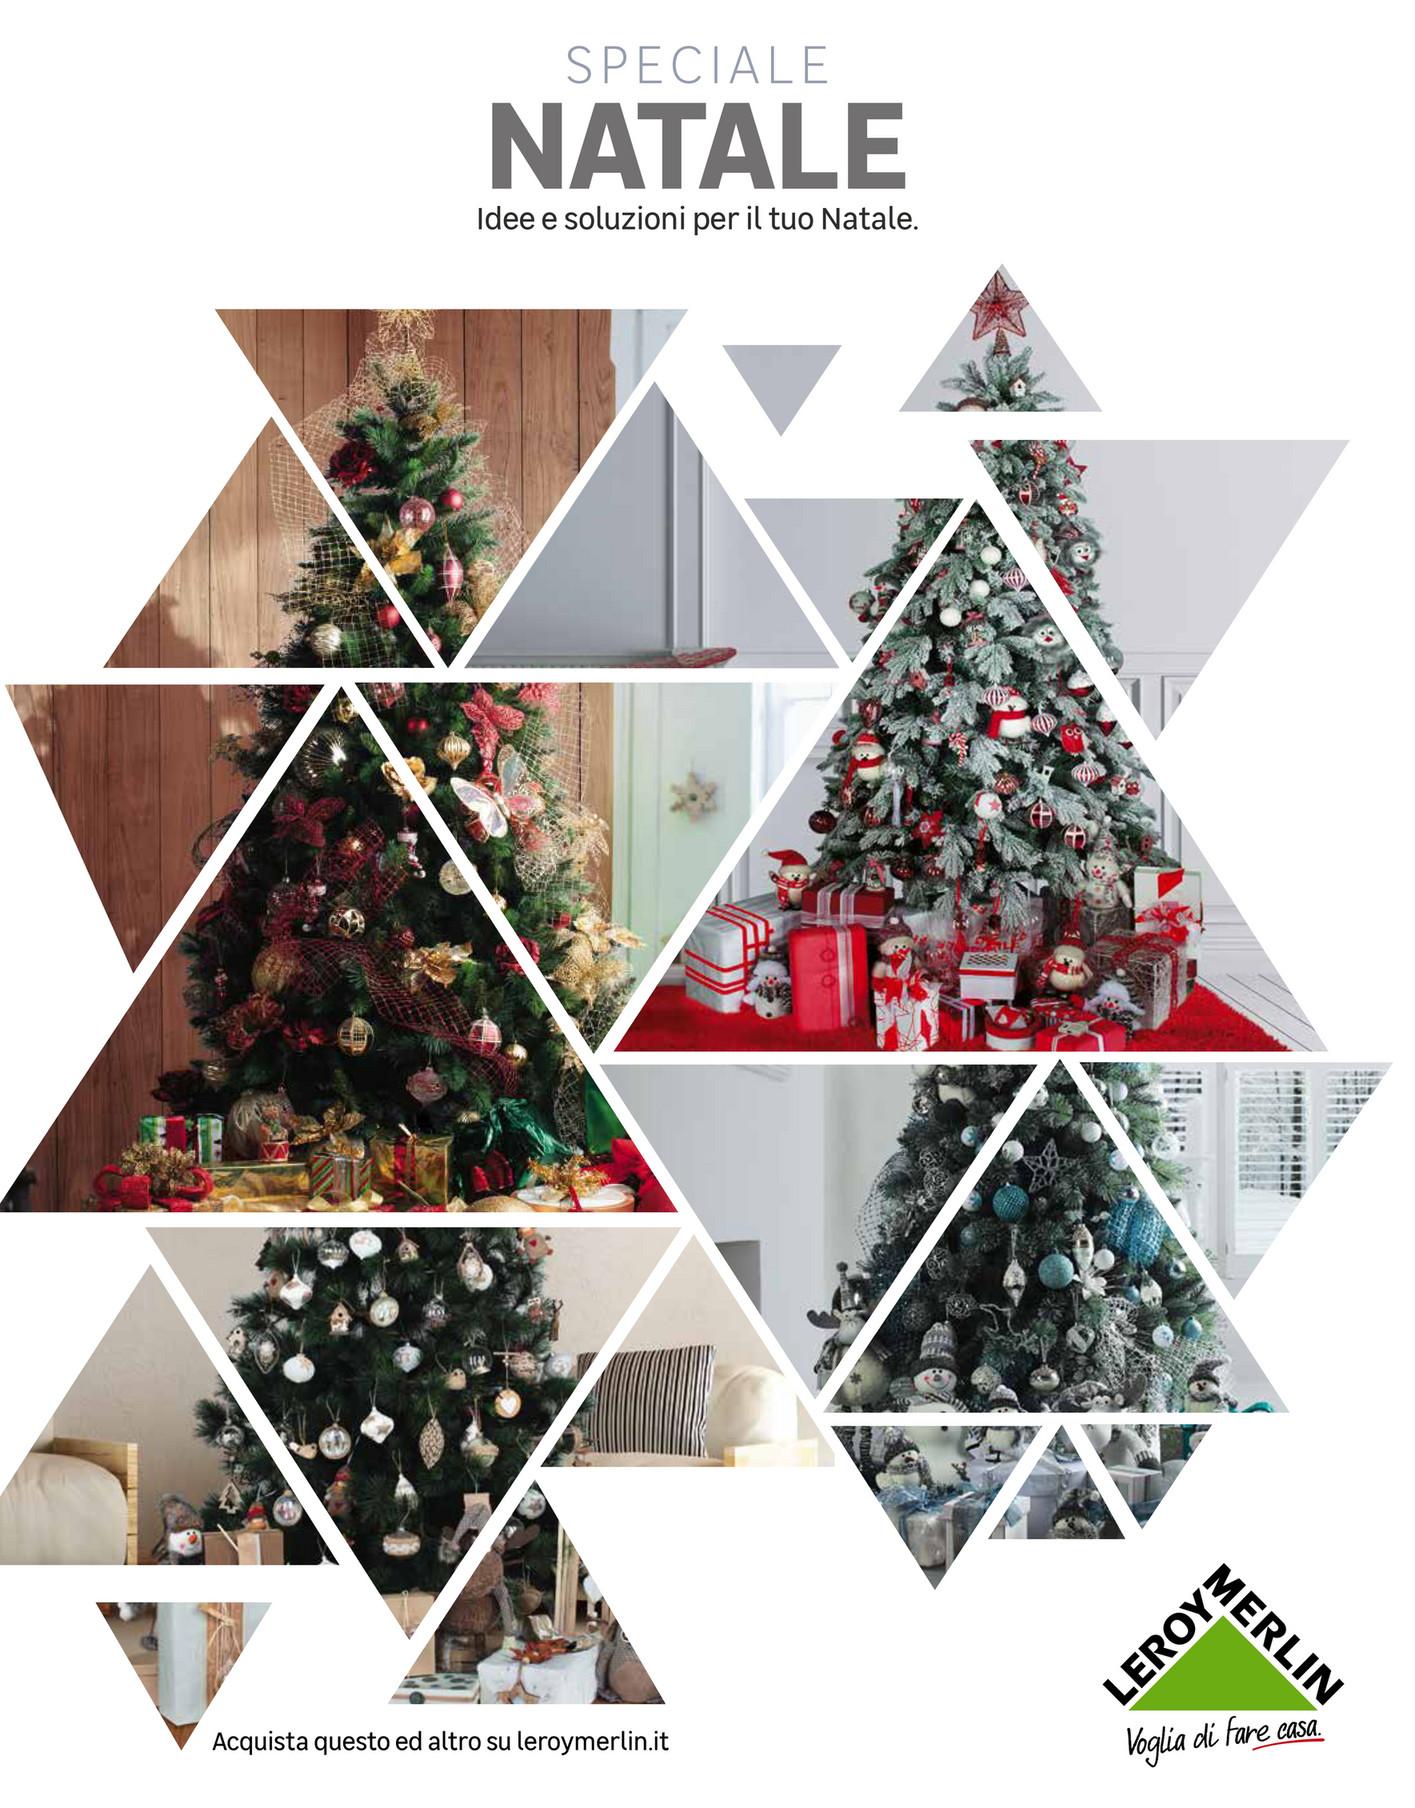 High Quality VolantinoFacile   Brochure Natale Leroy Merlin Dal 3 Novembre Al 25  Dicembre   Pagina 14 15